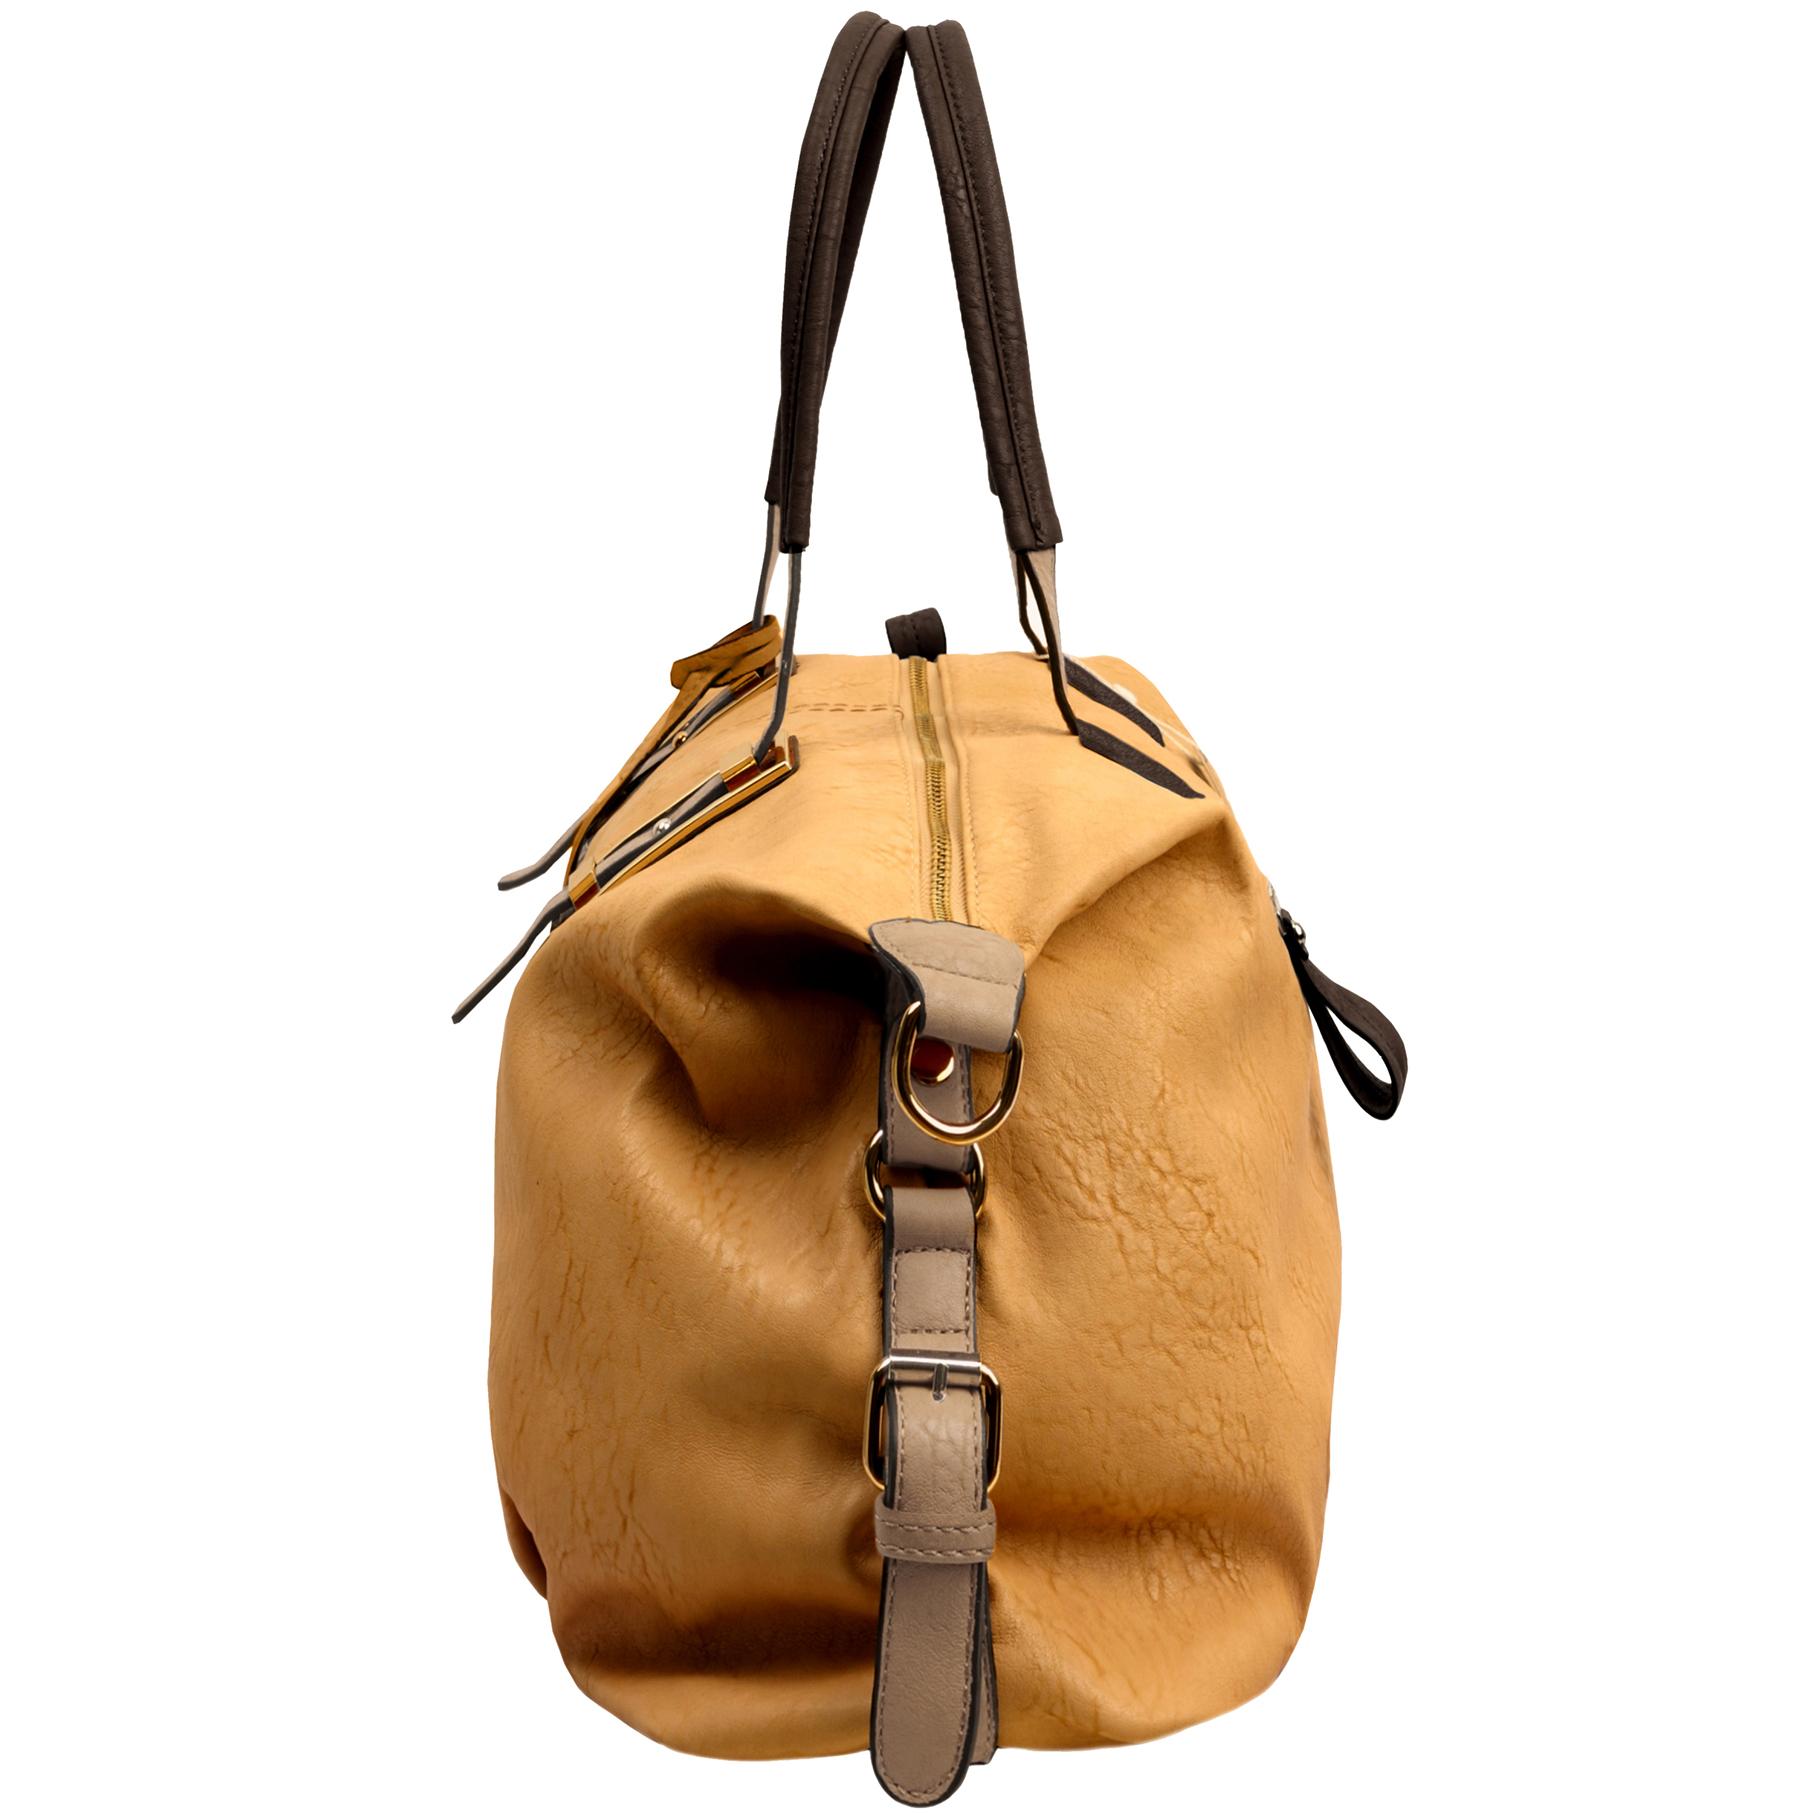 ACACIA Caramel Large Everyday Shopper Hobo Handbag Side